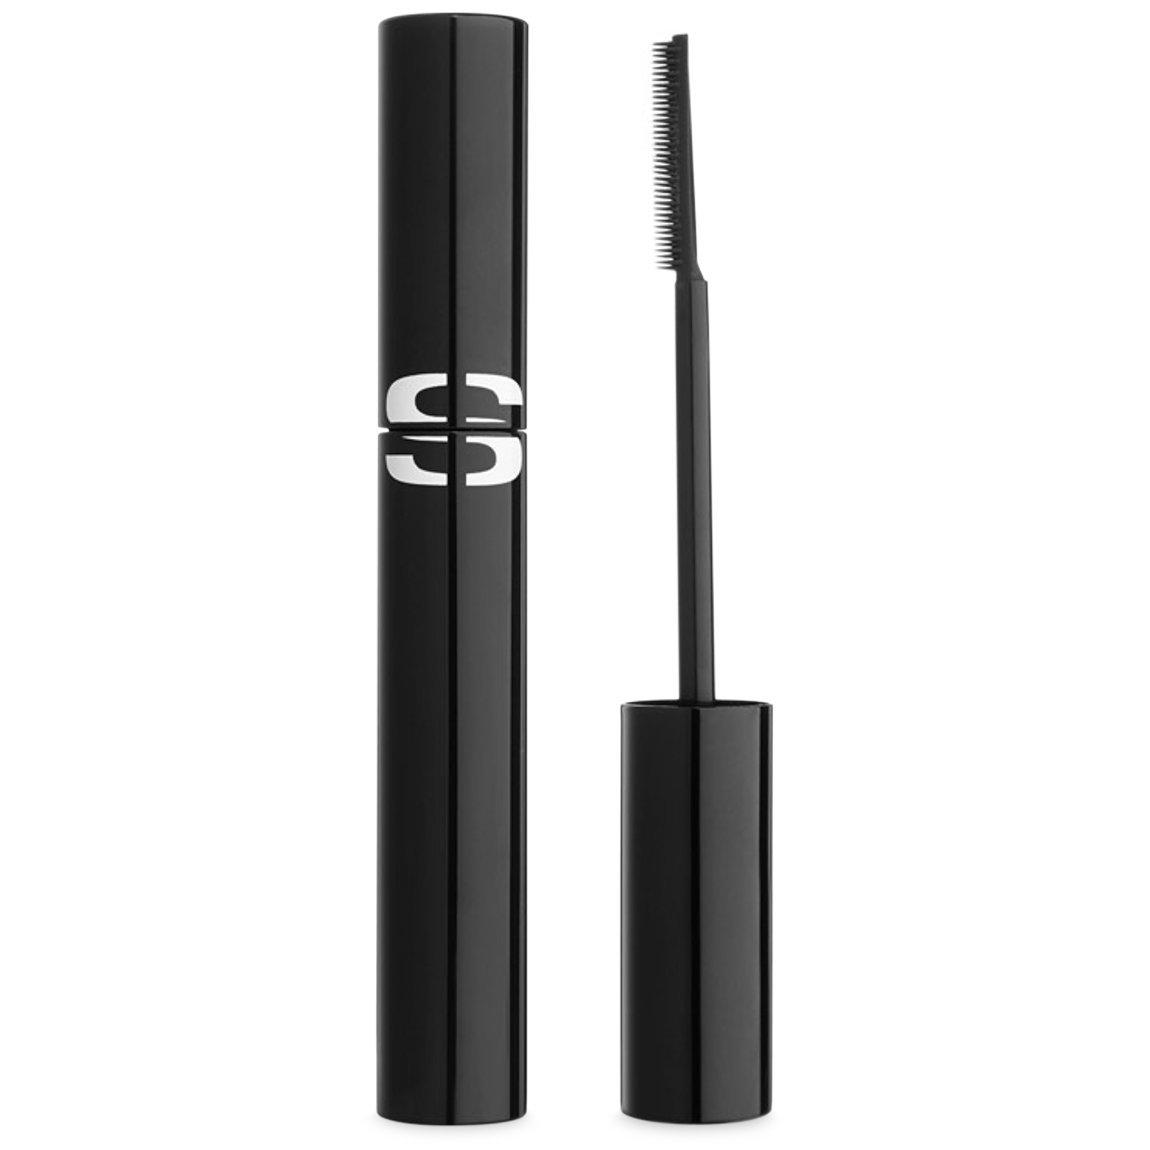 Sisley-Paris Mascara So Intense 1 Deep Black alternative view 1.